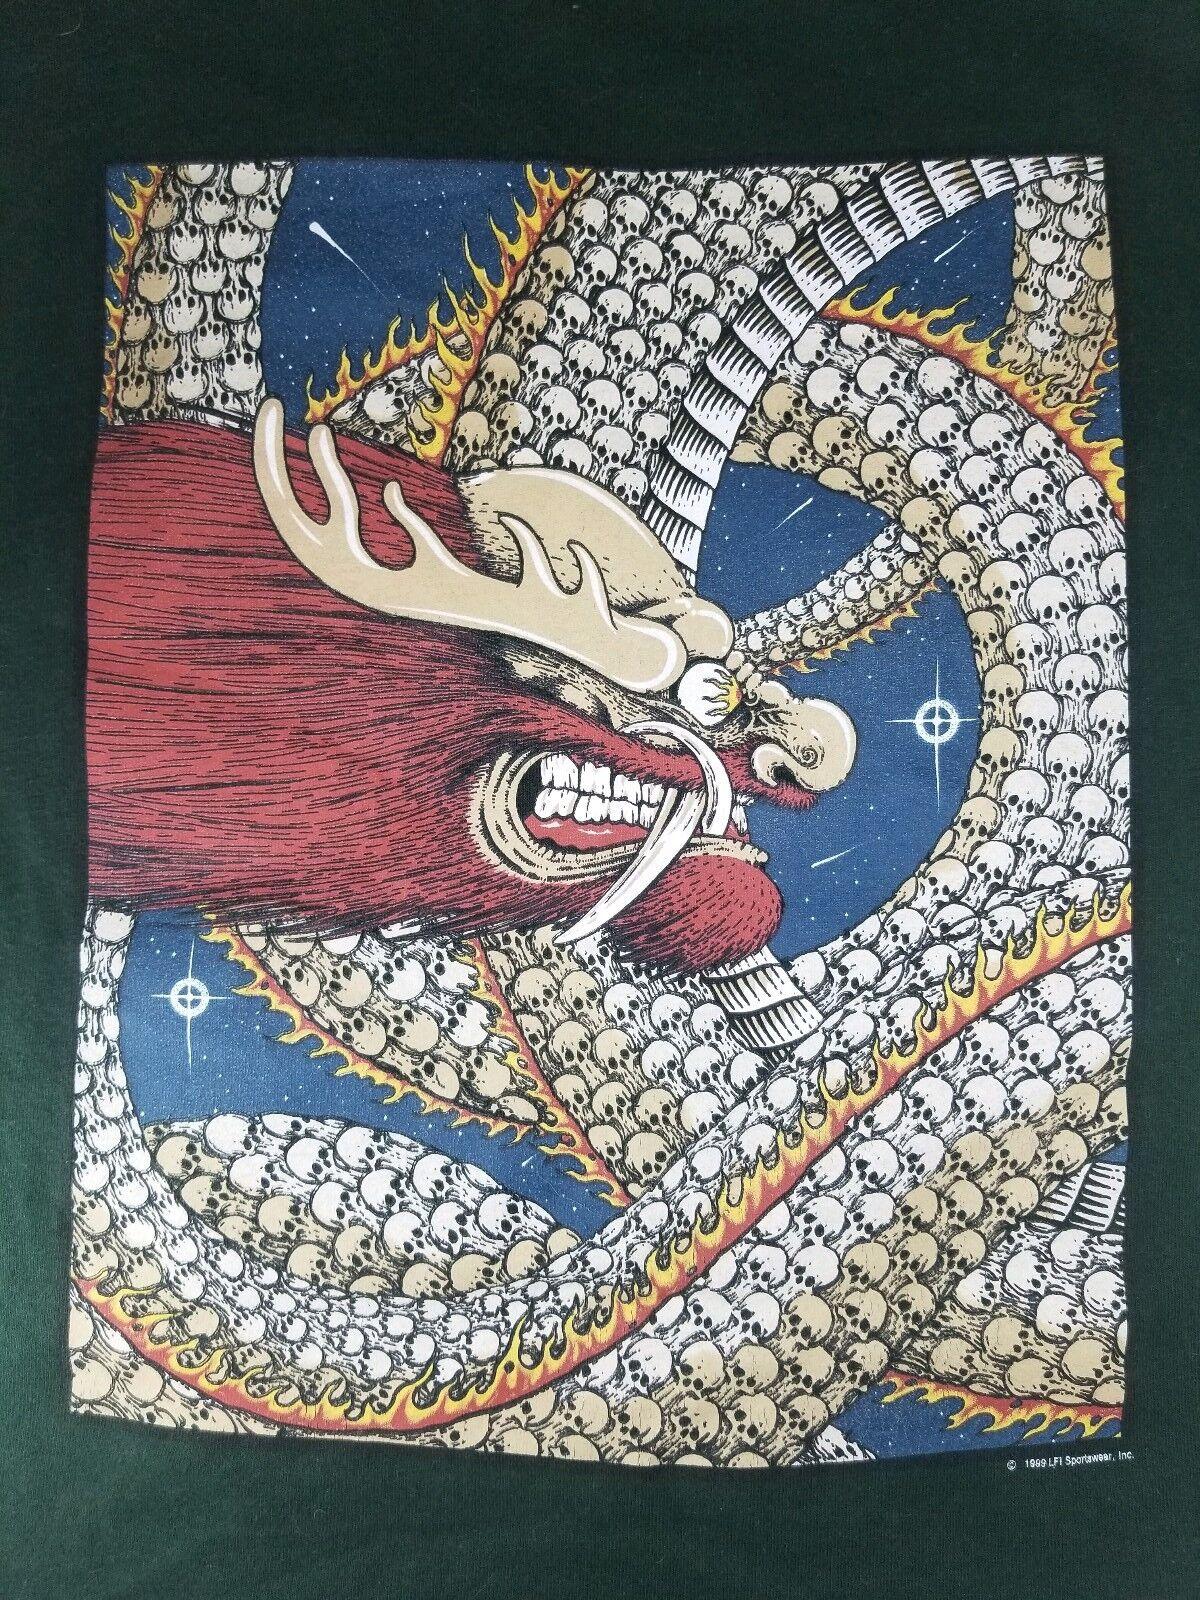 männer 5X Grün Themd Back Graphic Dragon Skull Flame Rock Punk Vtg 99' Cool Rare